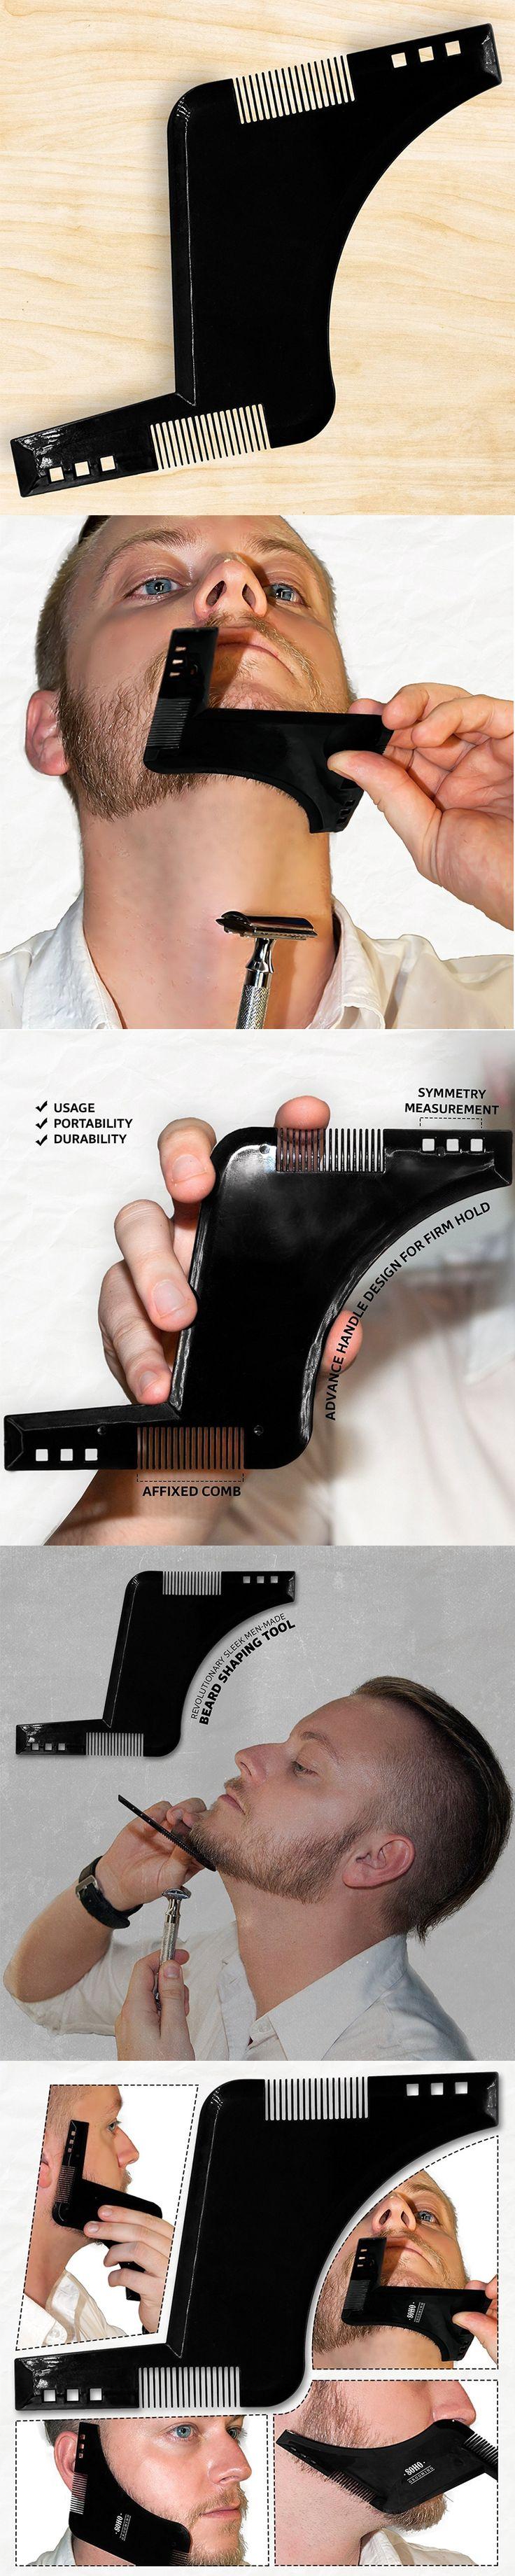 Beard Shaping Template High Quality Beard Comb Plastic Hair Brush Cut Beard Shaver Template Comb Cheap B111